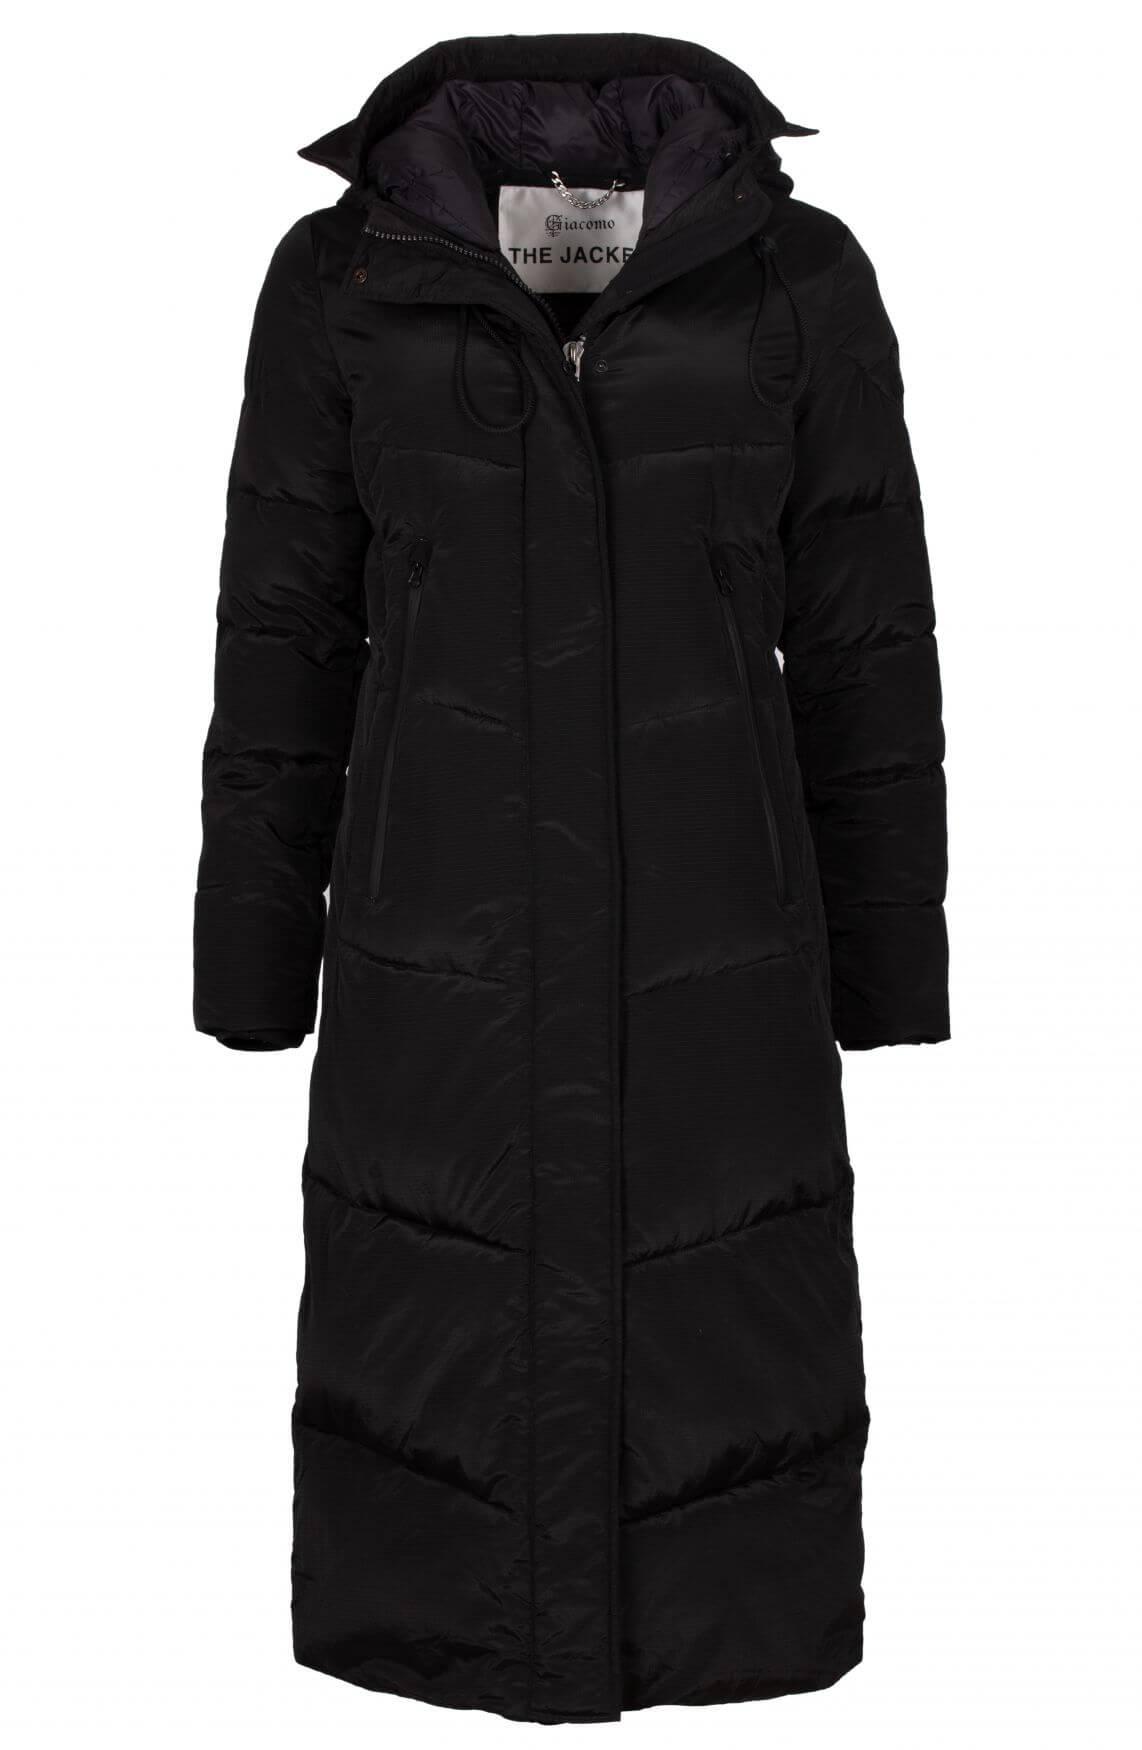 Giacomo Dames Gewatteerde jas zwart